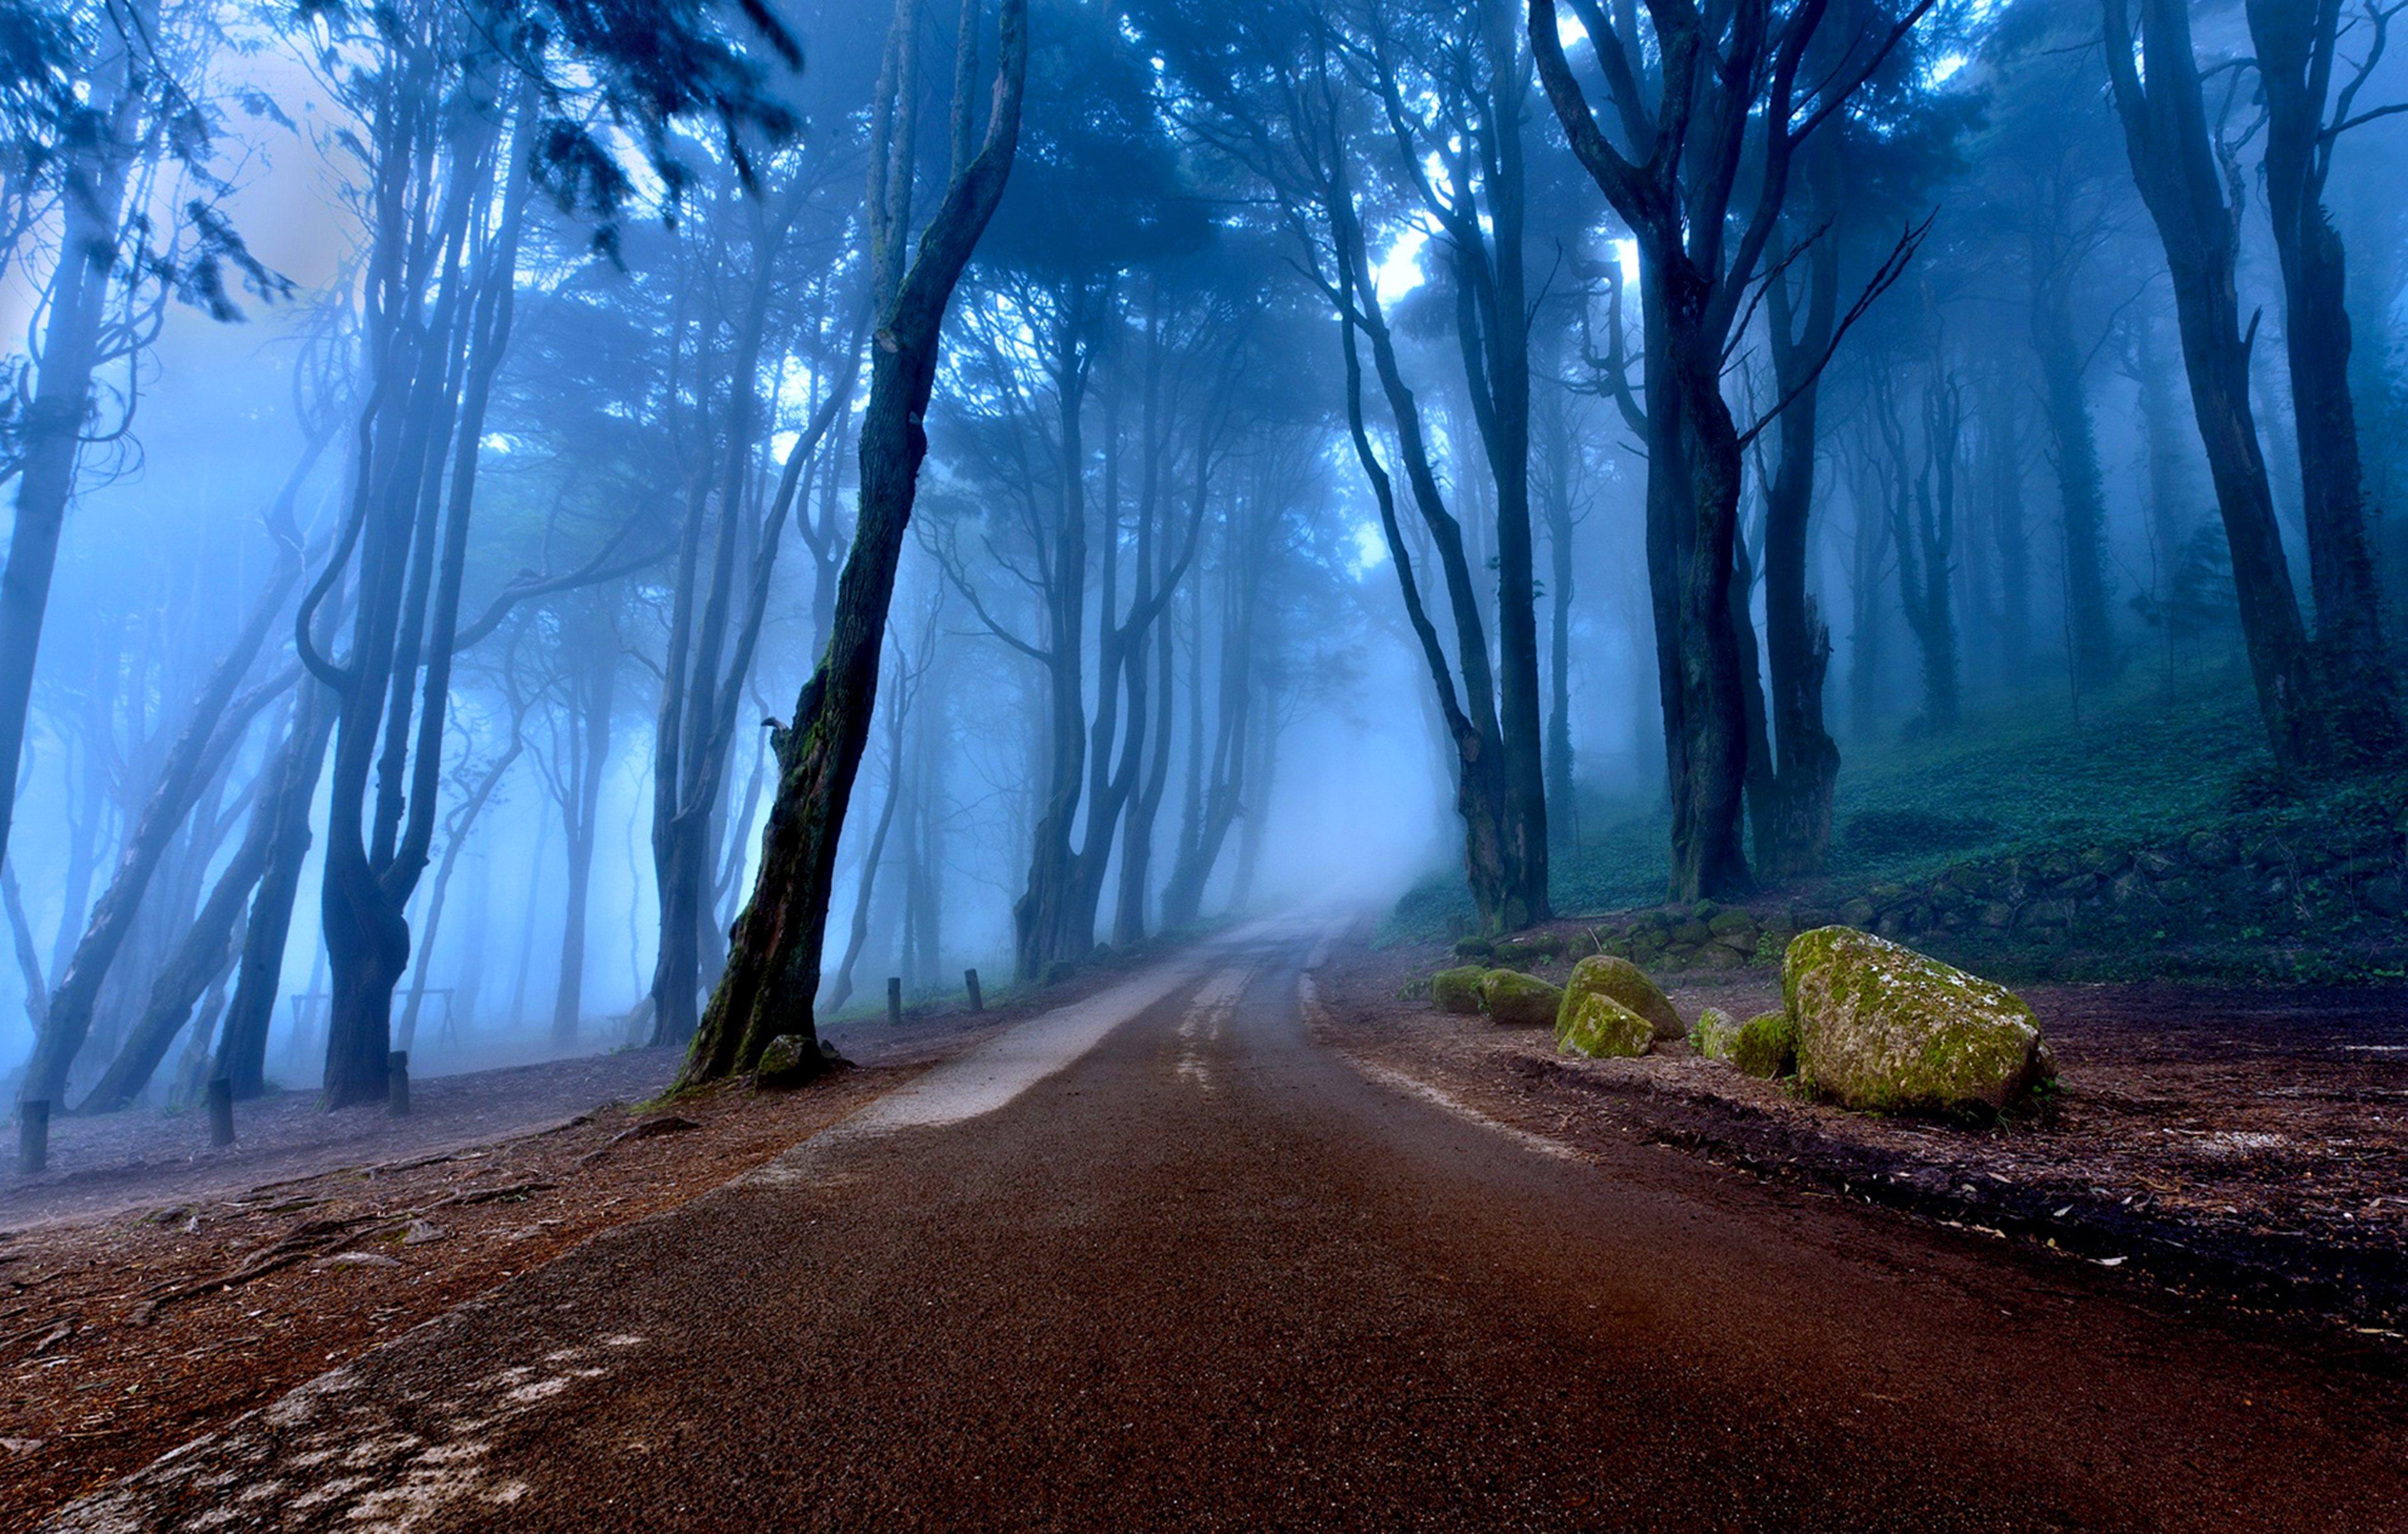 blue road nature photo - photo #16